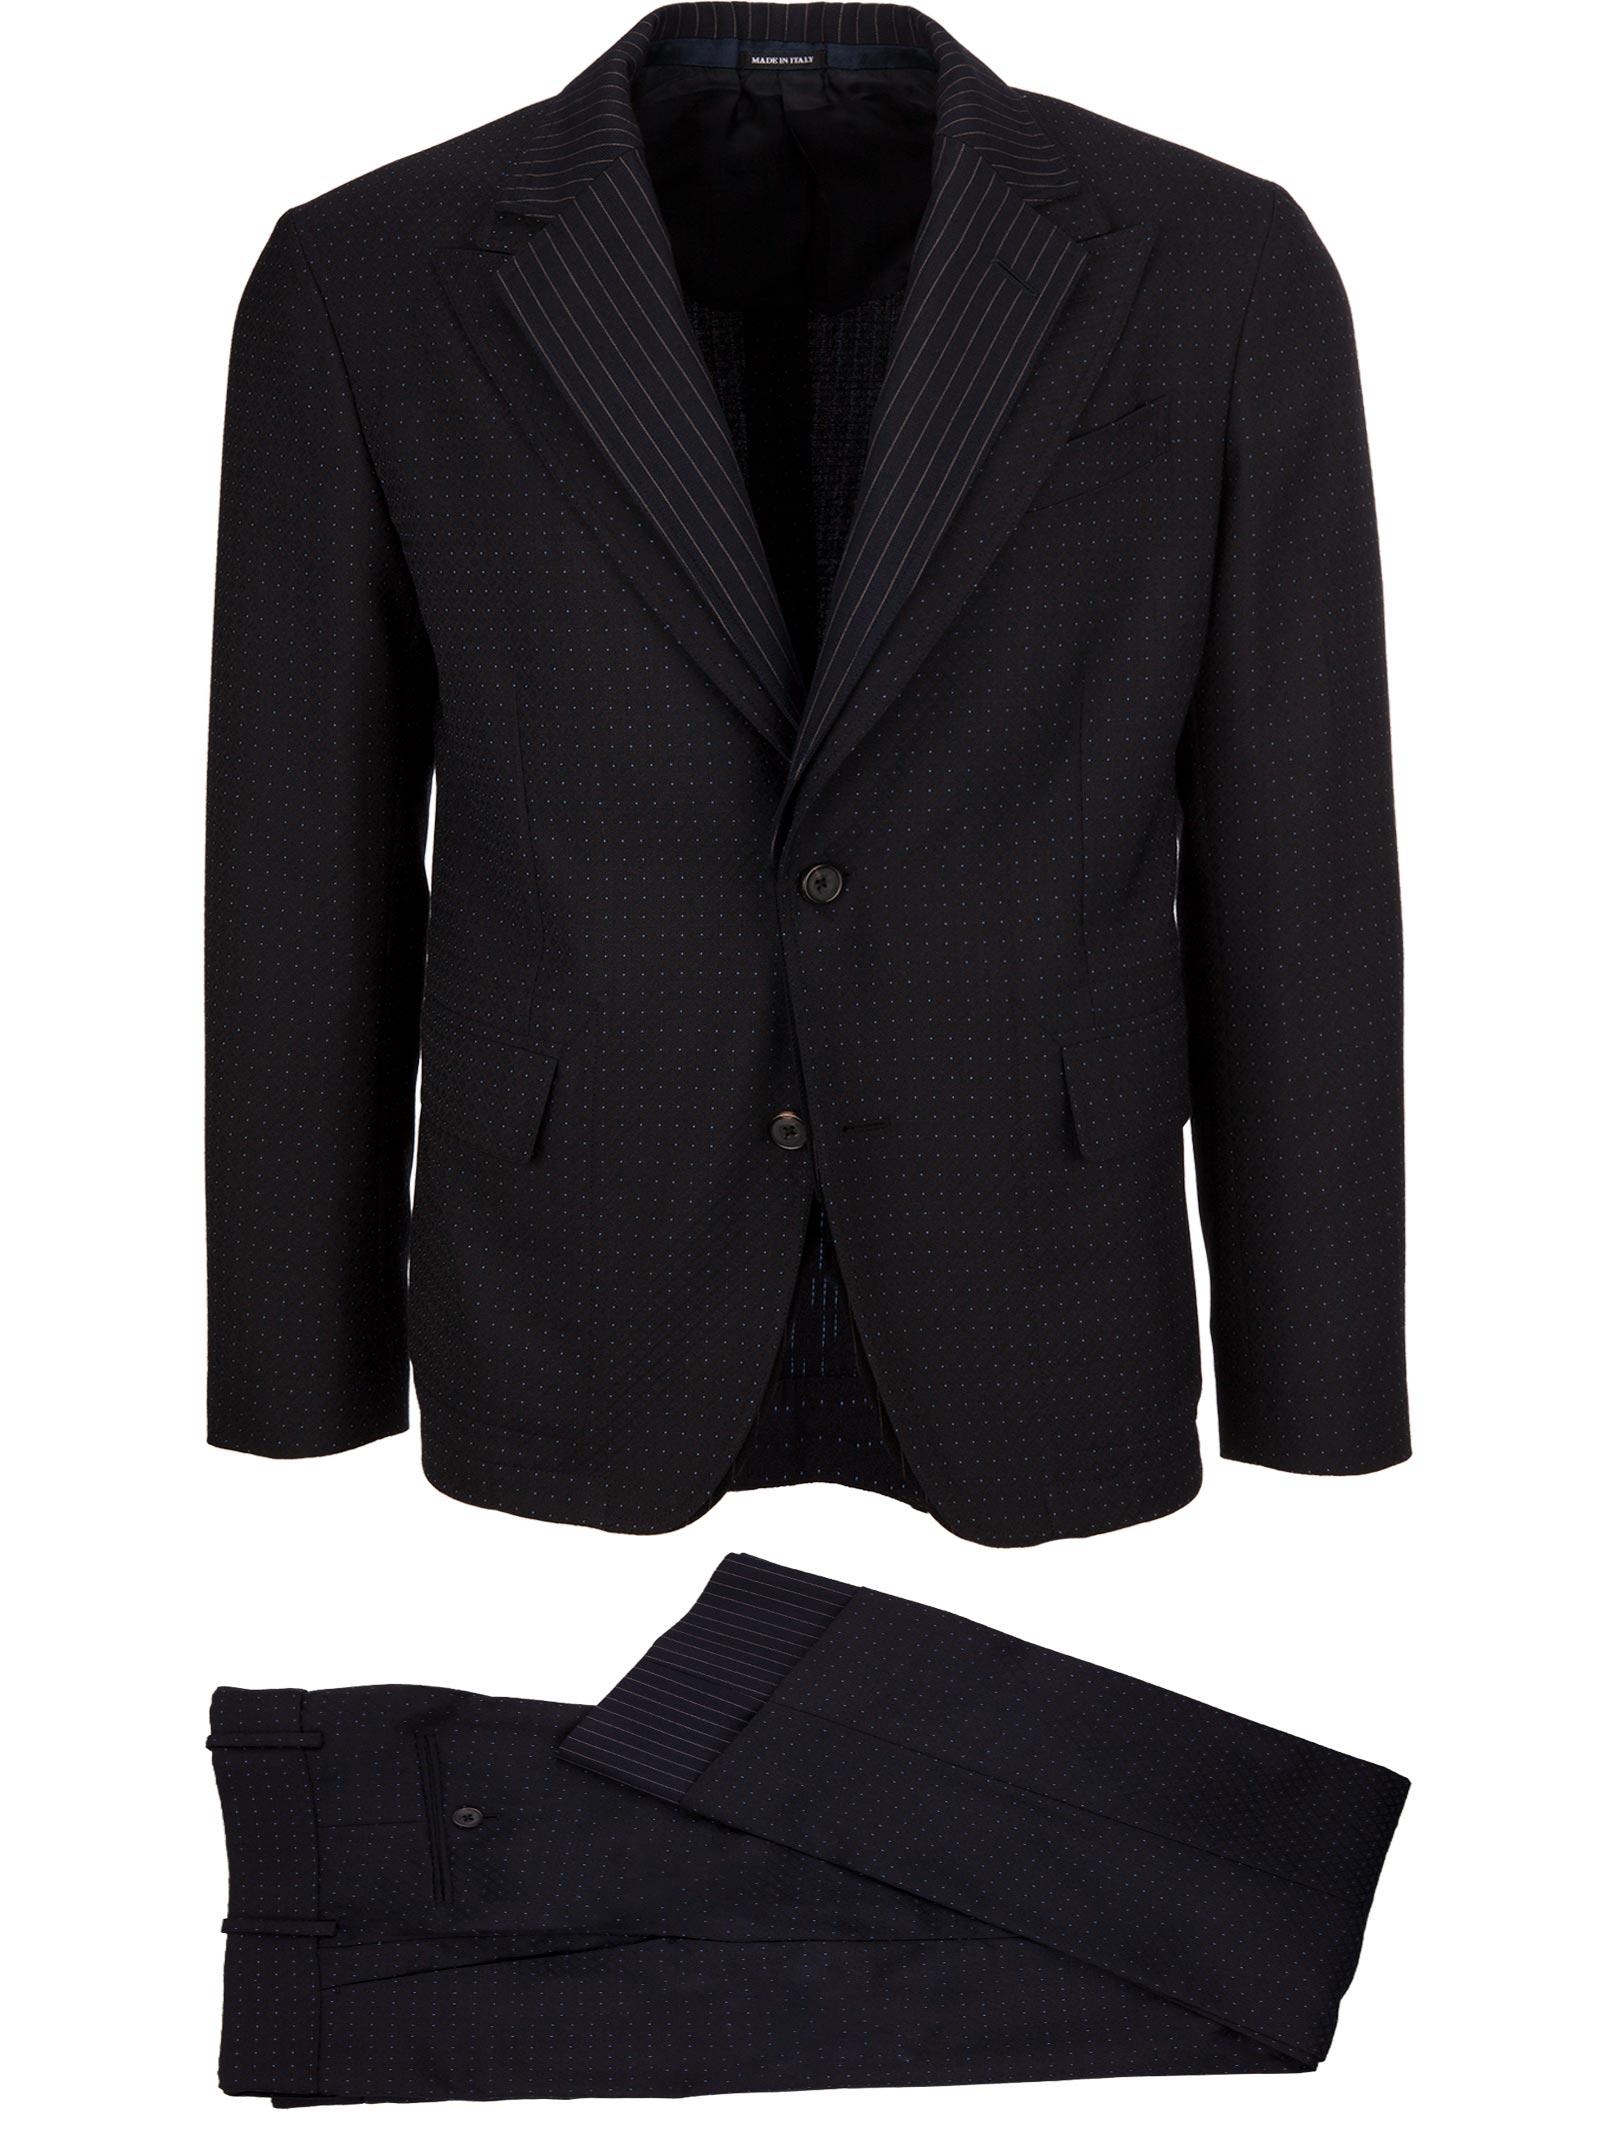 size 40 3af72 0b324 Alexander McQueen dress